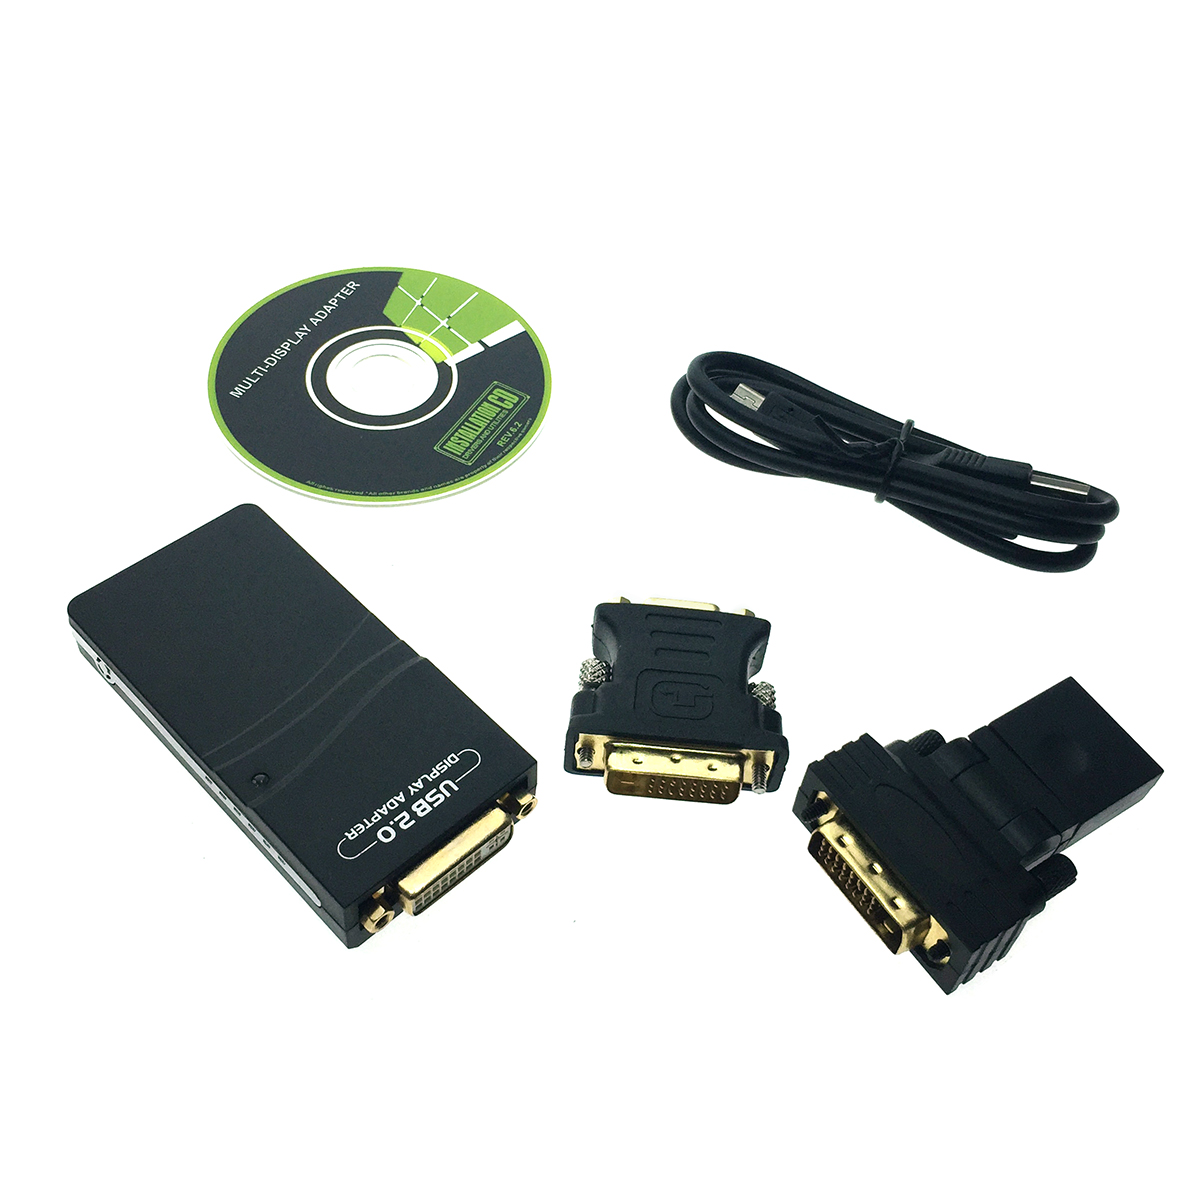 Видео конвертер USB 2.0 to VGA/HDMI/DVI, Full HD 1080p, H000USB Espada чипсет DisplayLink DL-165